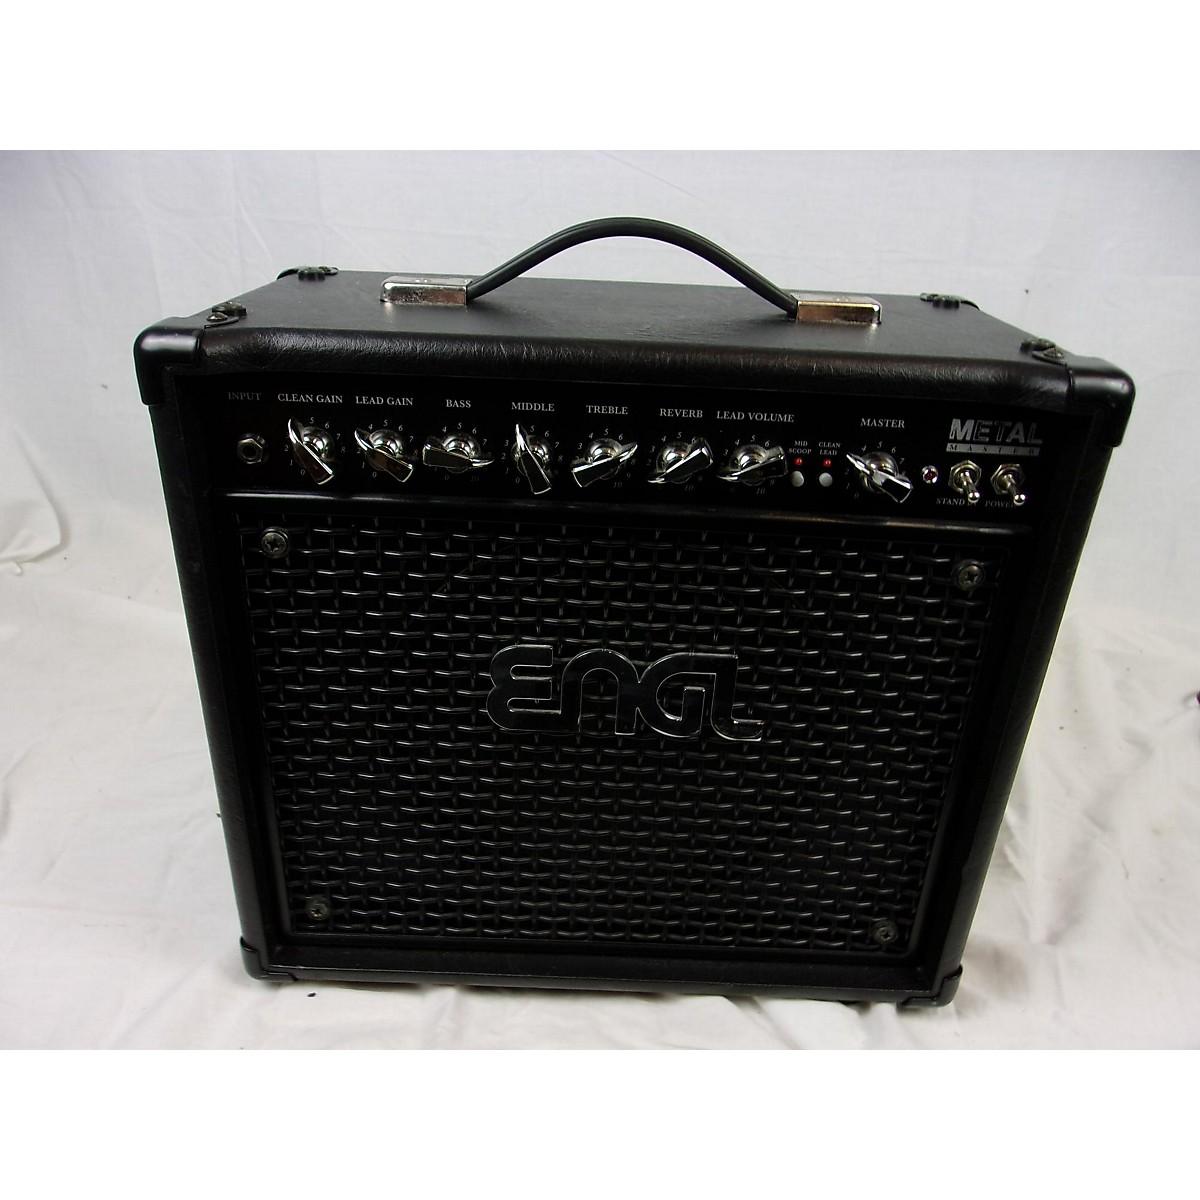 Engl Metal Master Tube Guitar Combo Amp